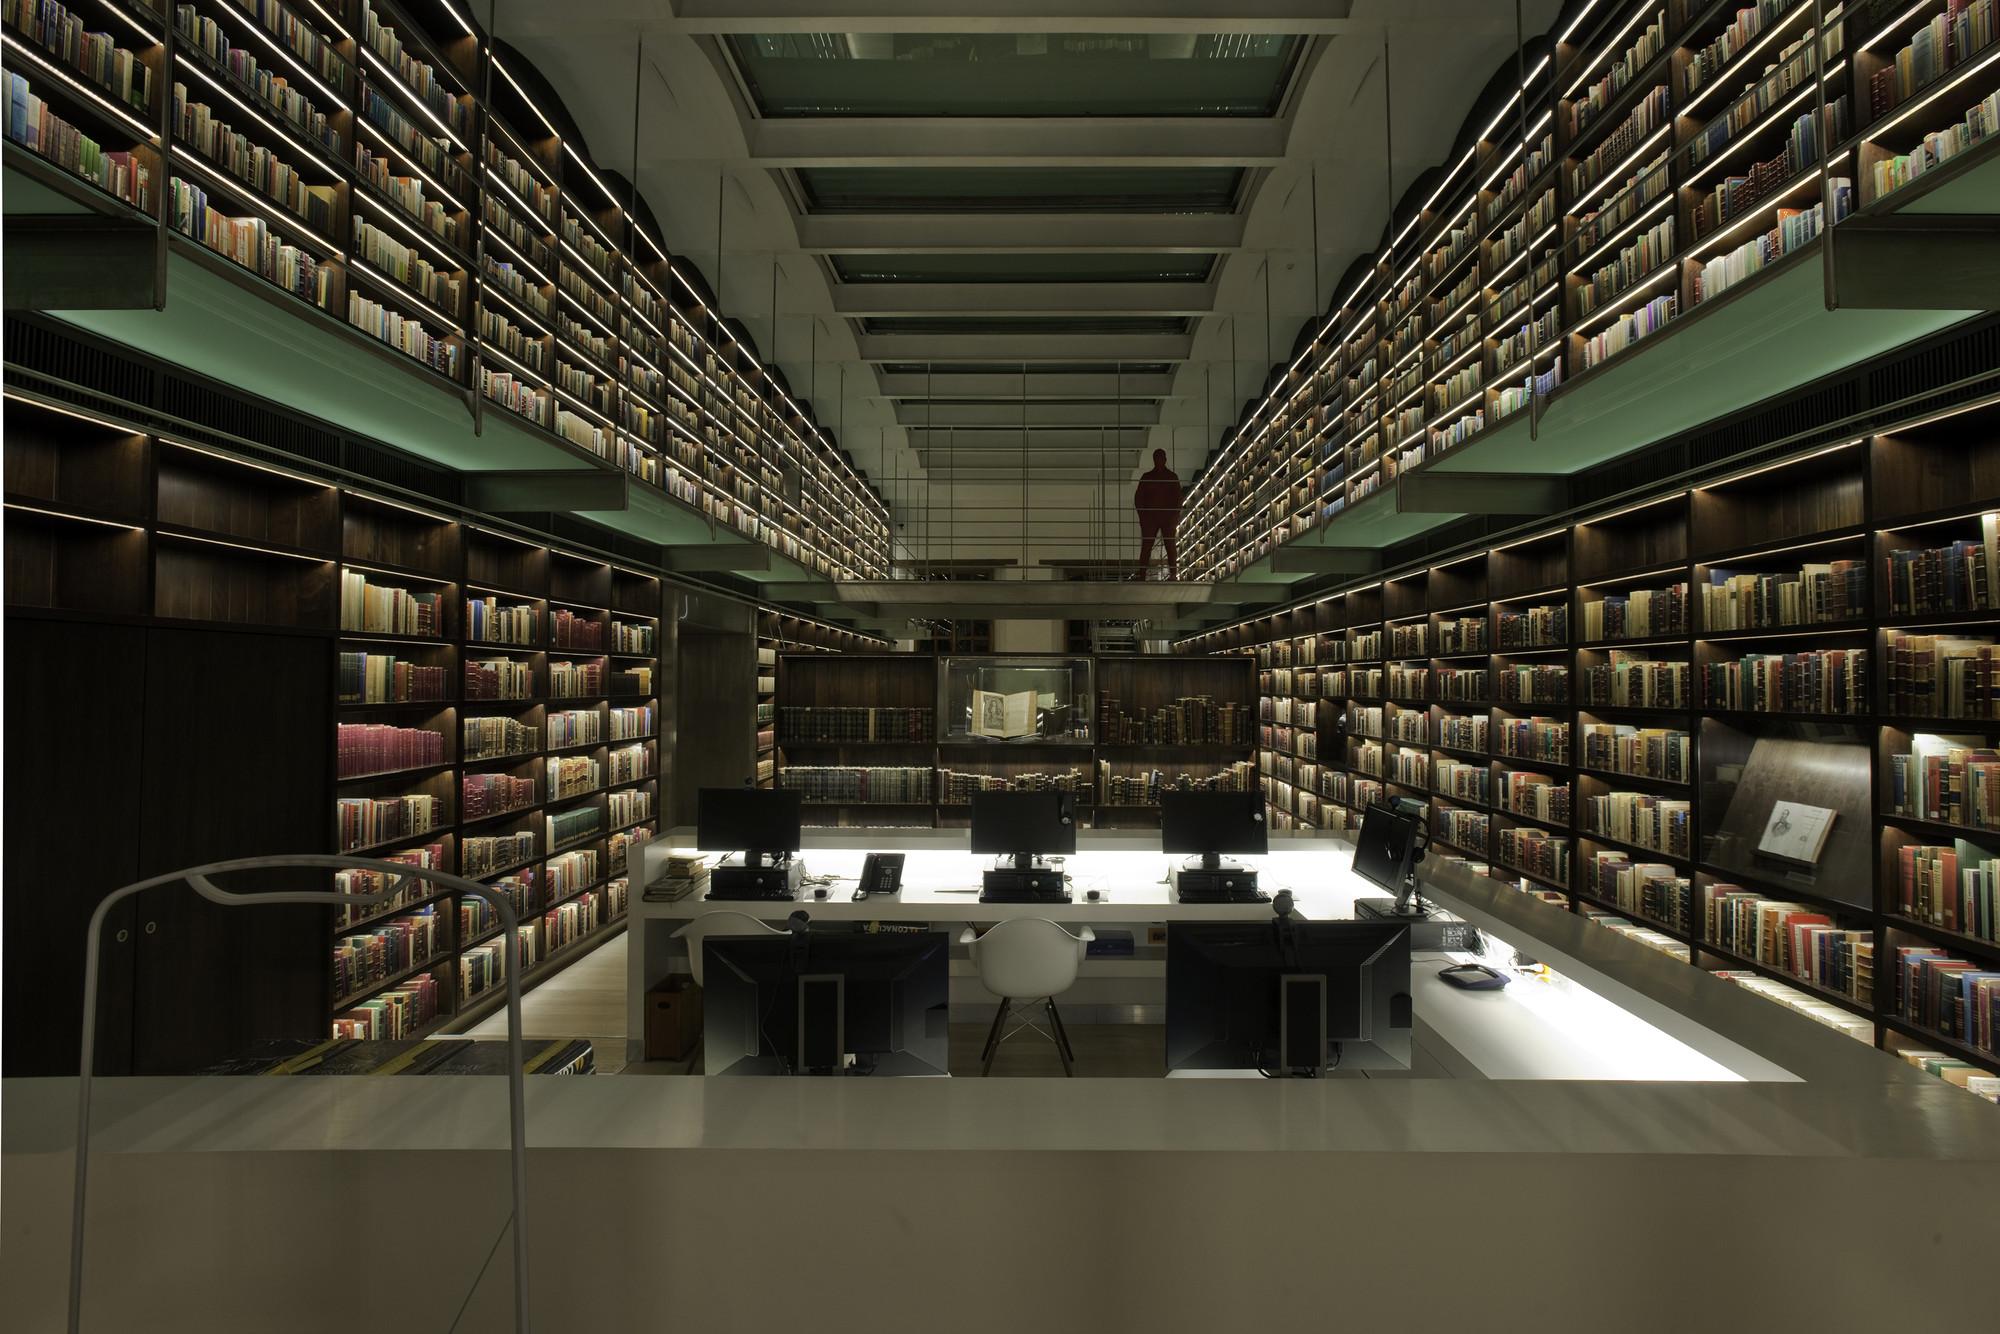 Biblioteca antonio castro leal bgp arquitectura for Biblioteca arquitectura